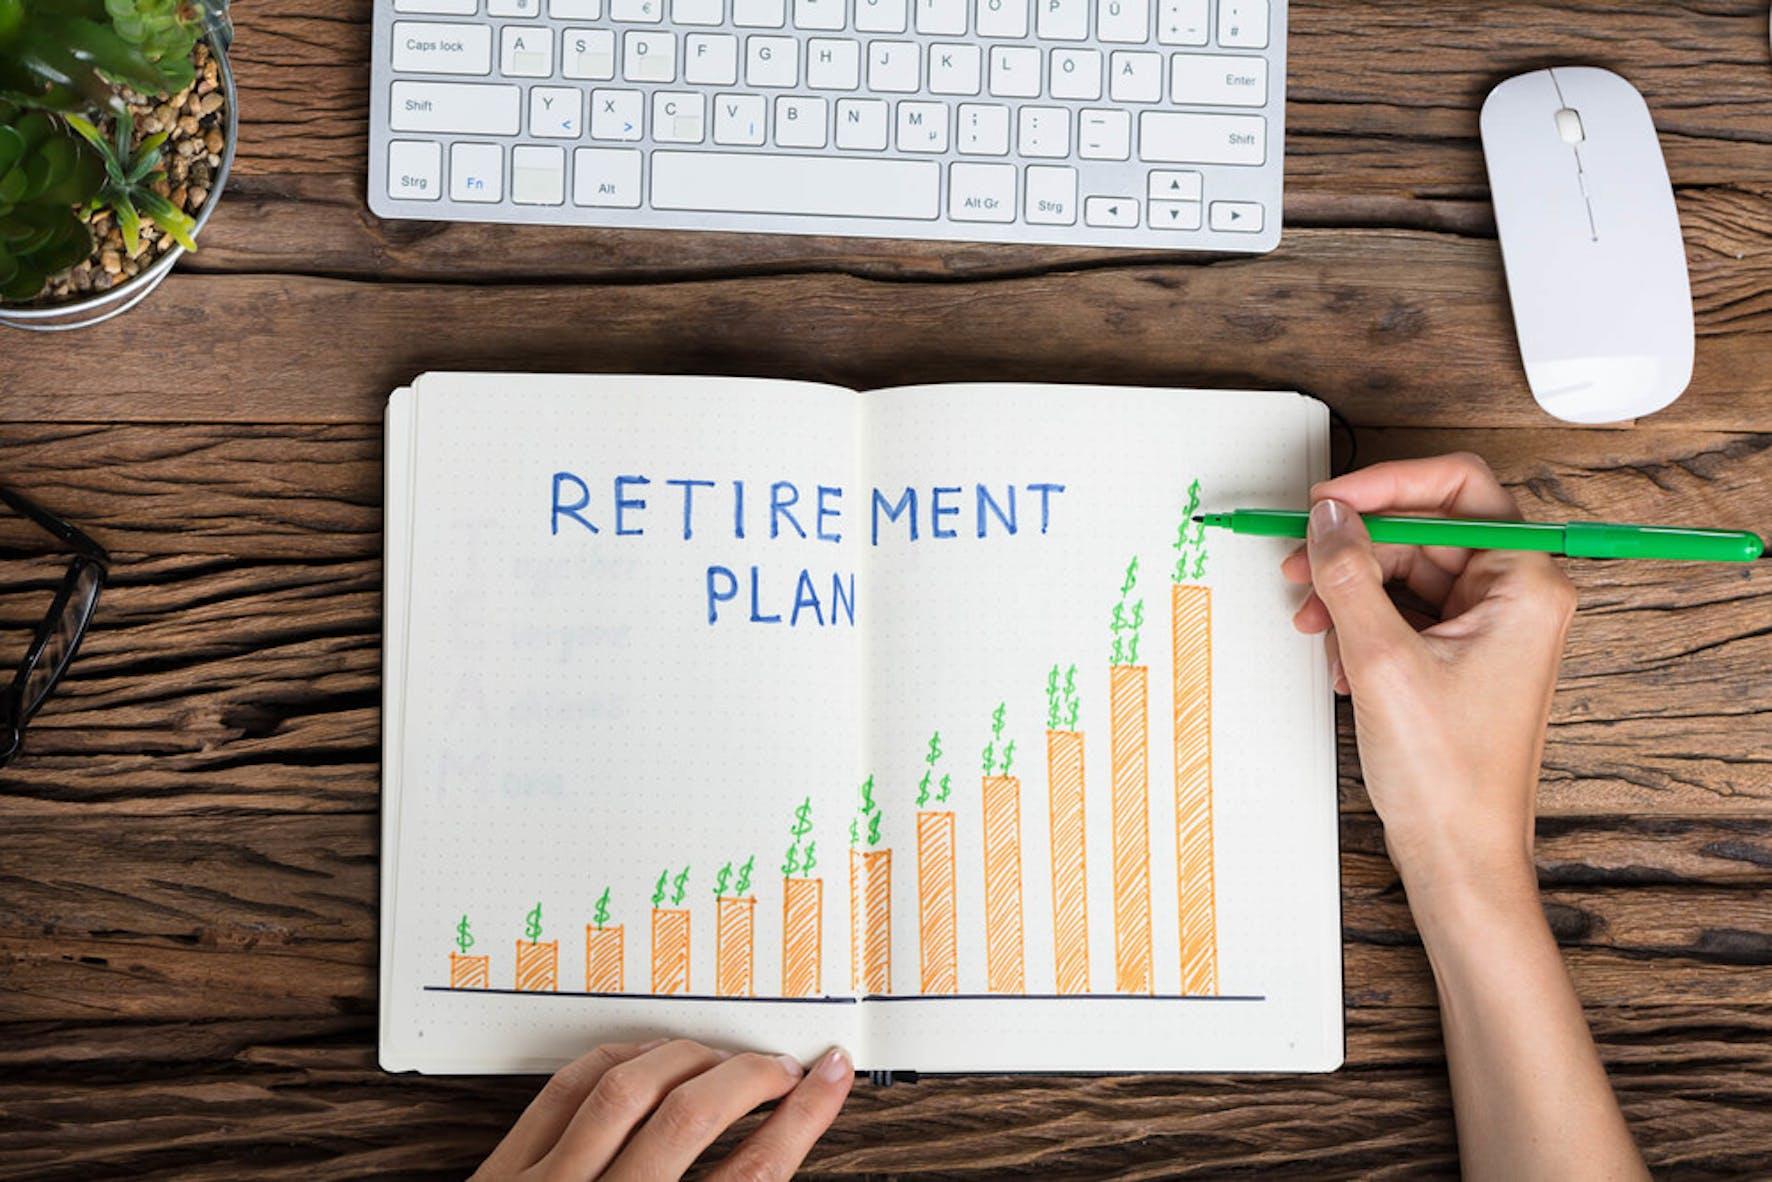 Retirement plan chart - save for retirement